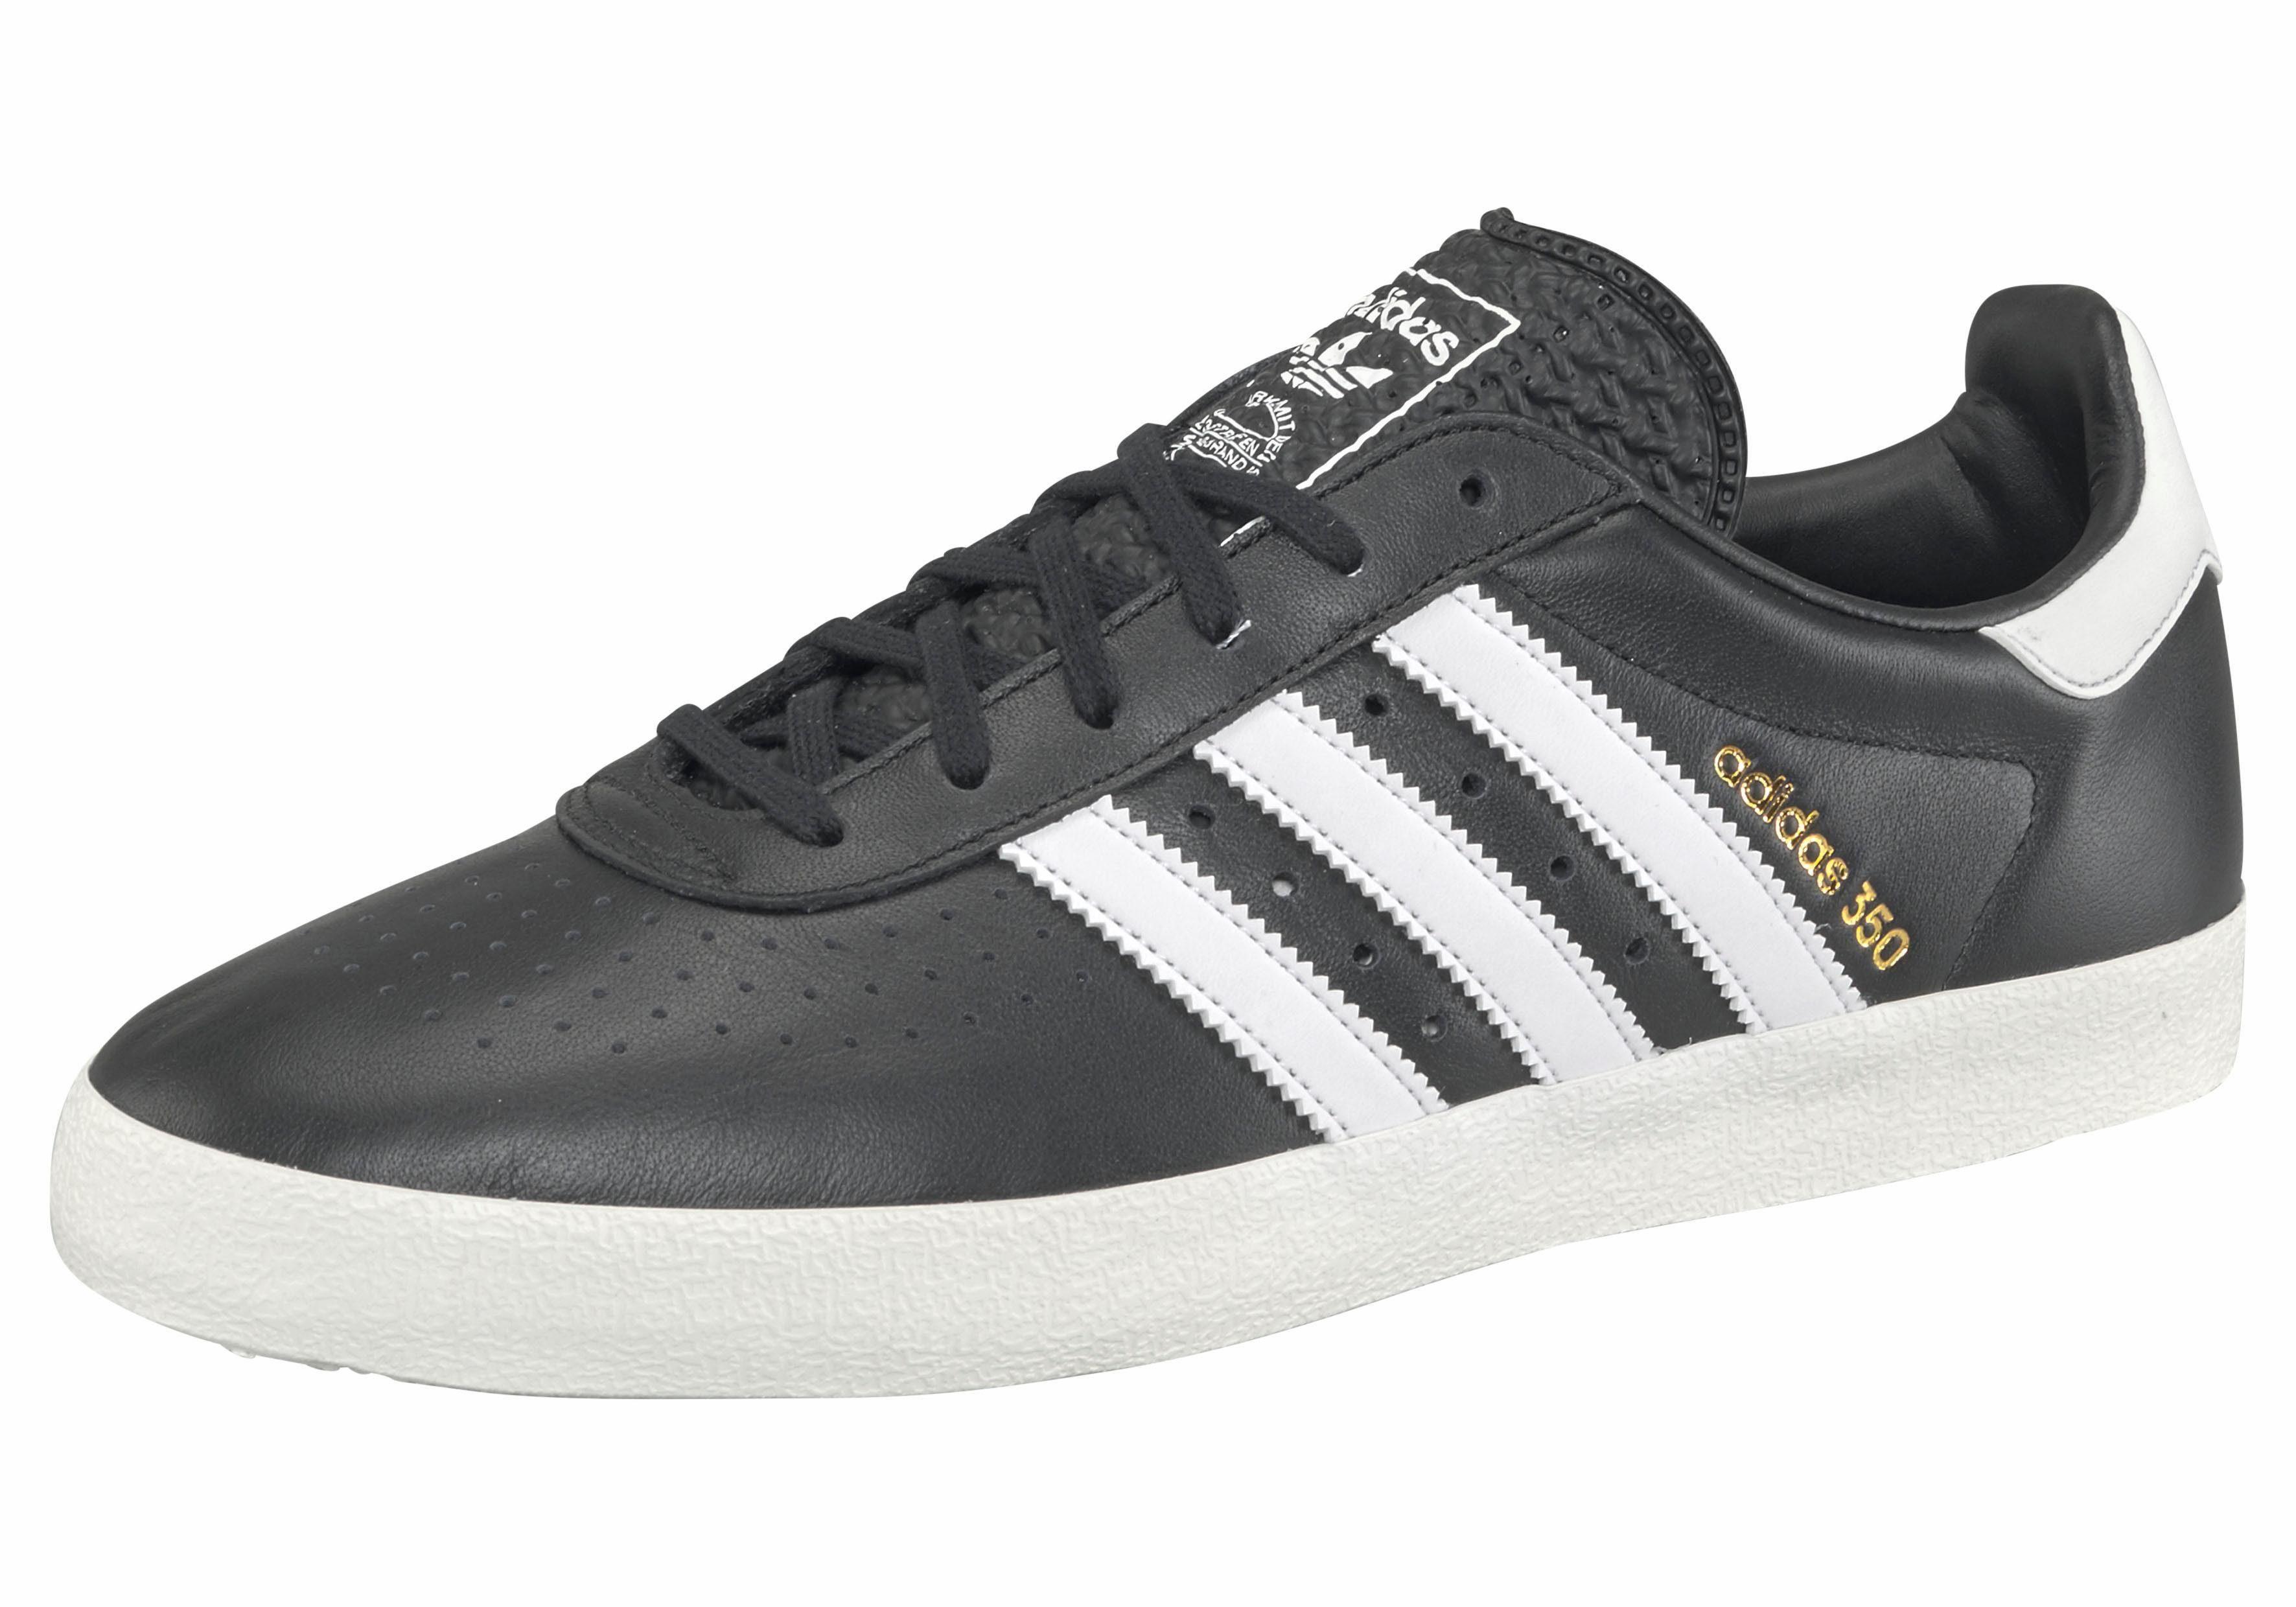 adidas Originals »ADIDAS 350« Sneaker kaufen | OTTO